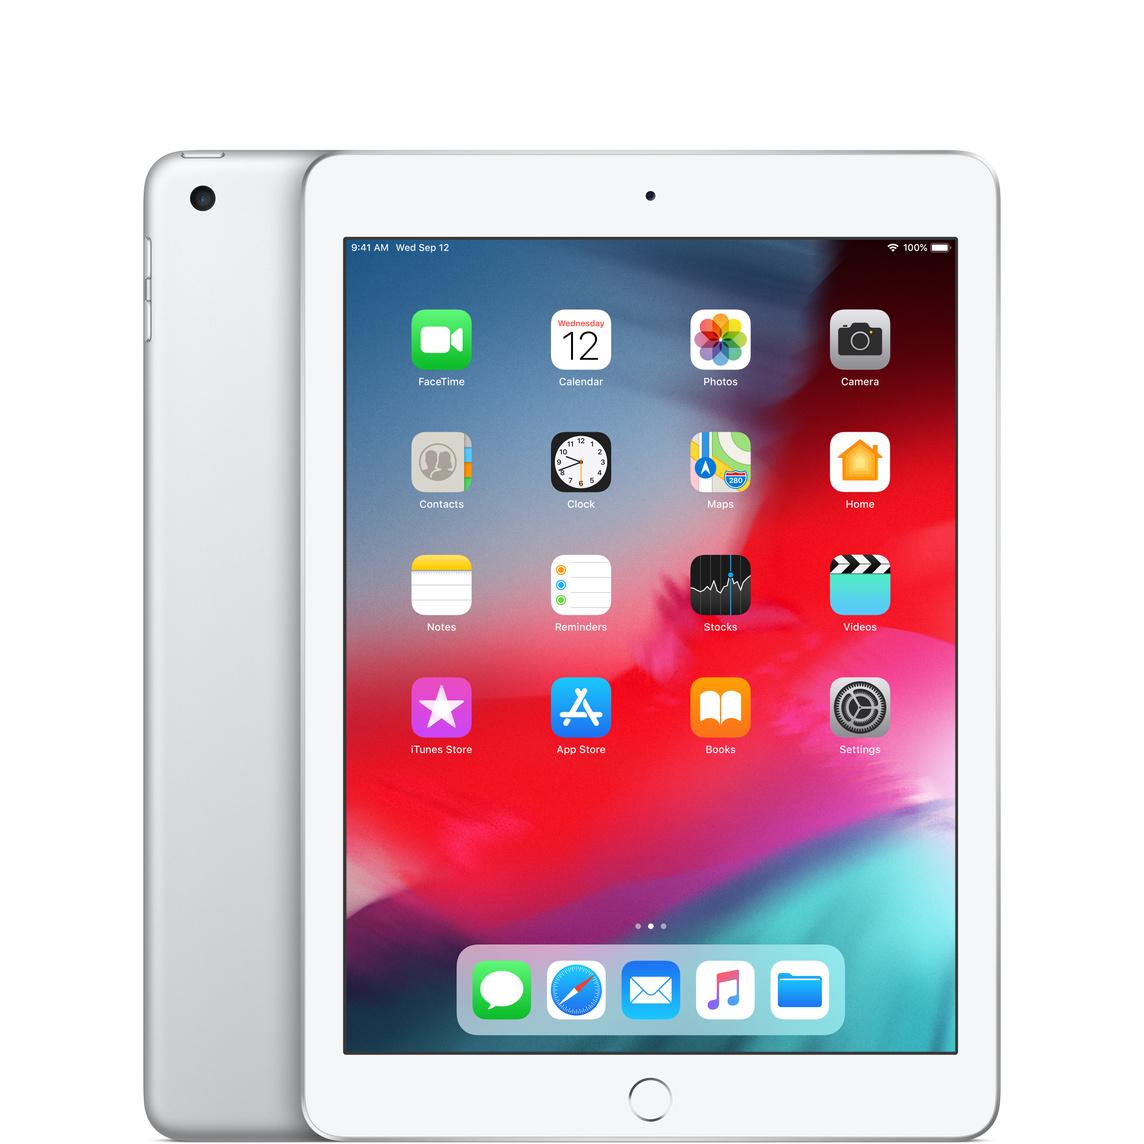 Refurbished iPad Wi-Fi 128GB - Silver (6th Generation) - Apple